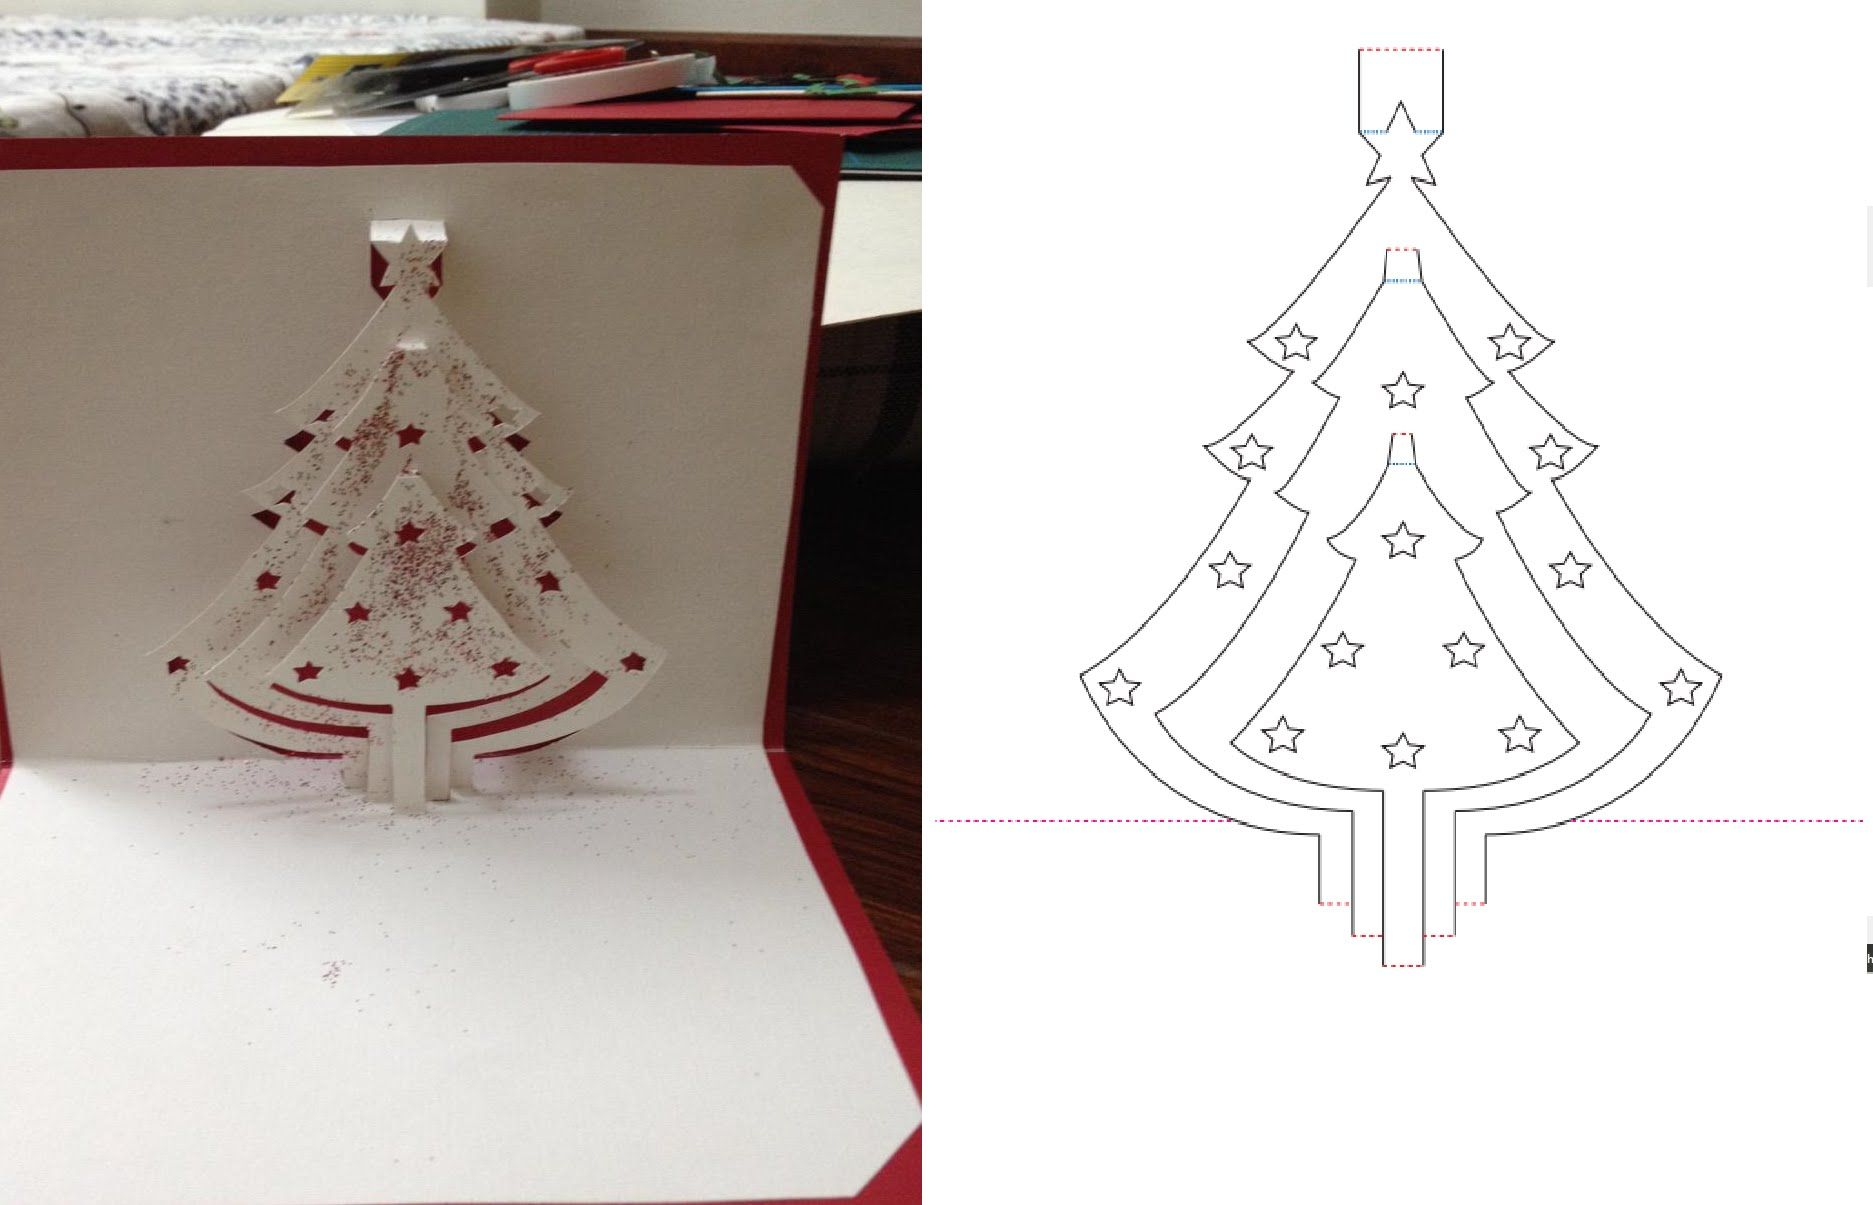 Dyi Christmas Tree Pop Up Card Tutorial Free Pattern Pop